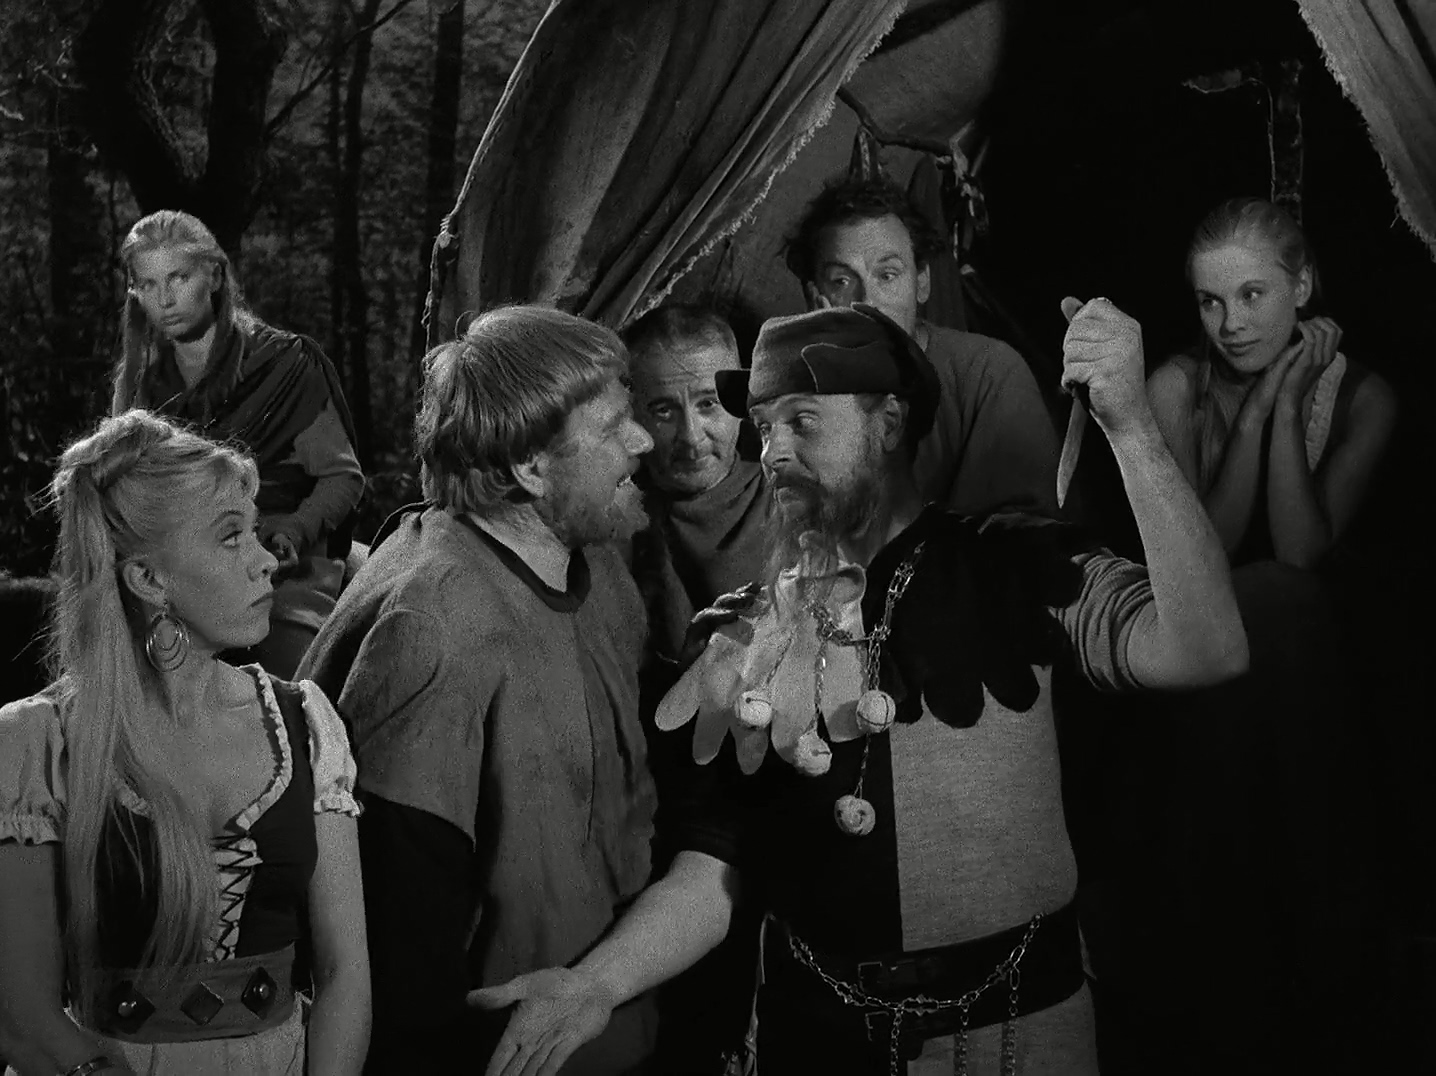 Bibi Andersson, Gunnar Björnstrand, Åke Fridell, Inga Gill, Gunnel Lindblom, Nils Poppe, and Erik Strandmark in Det sjunde inseglet (1957)